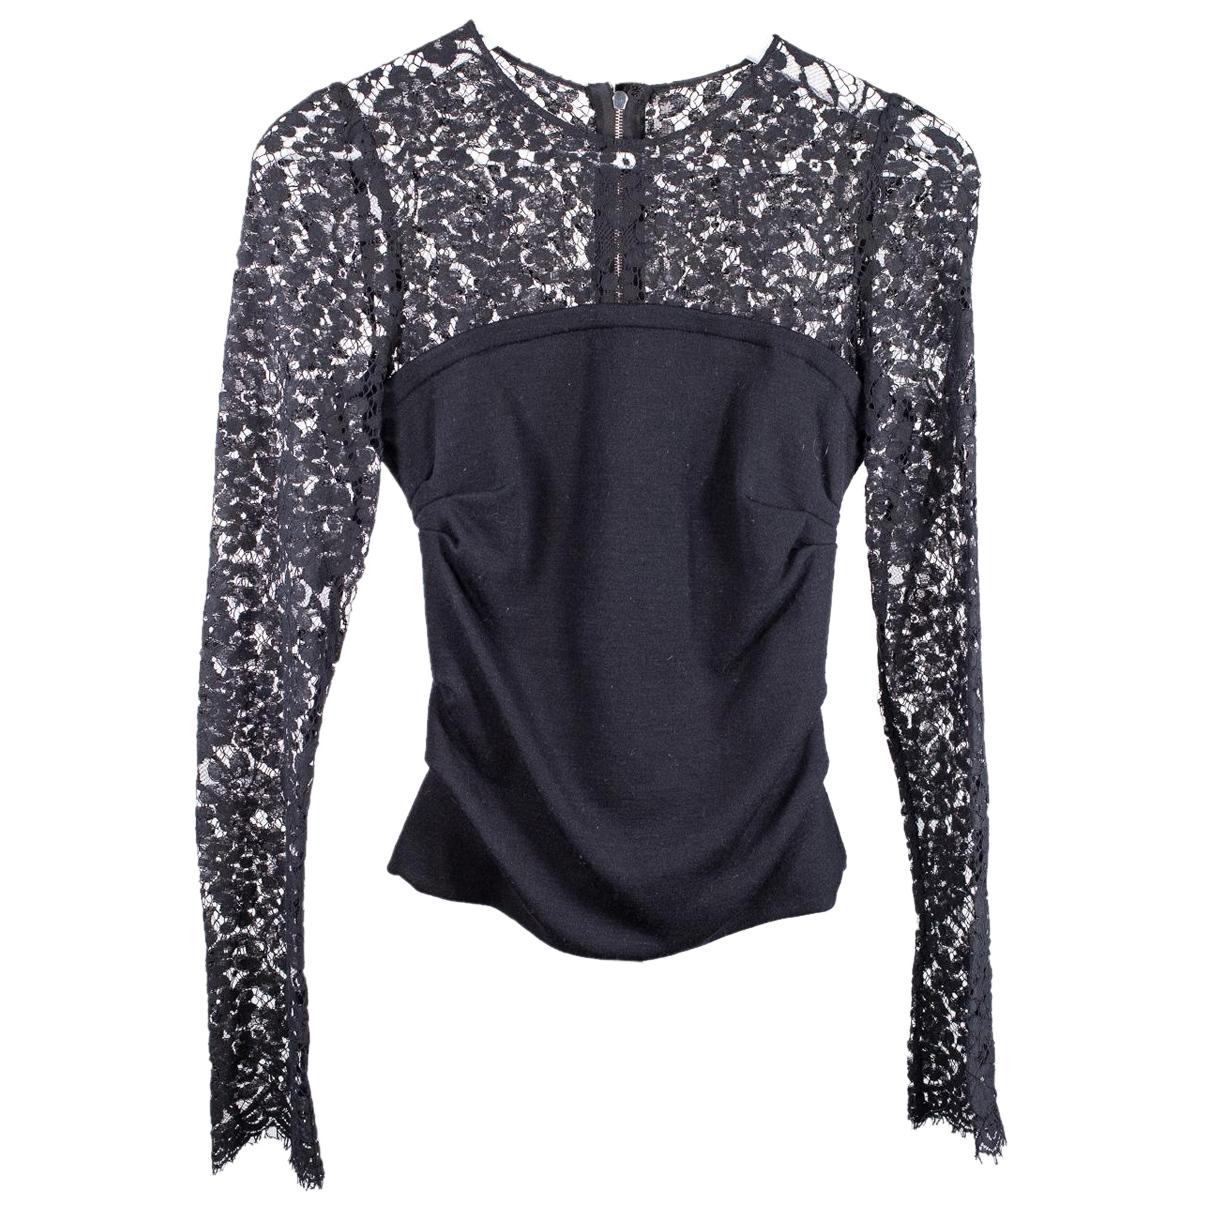 Dolce & Gabbana N Black Lace  top for Women 36 FR